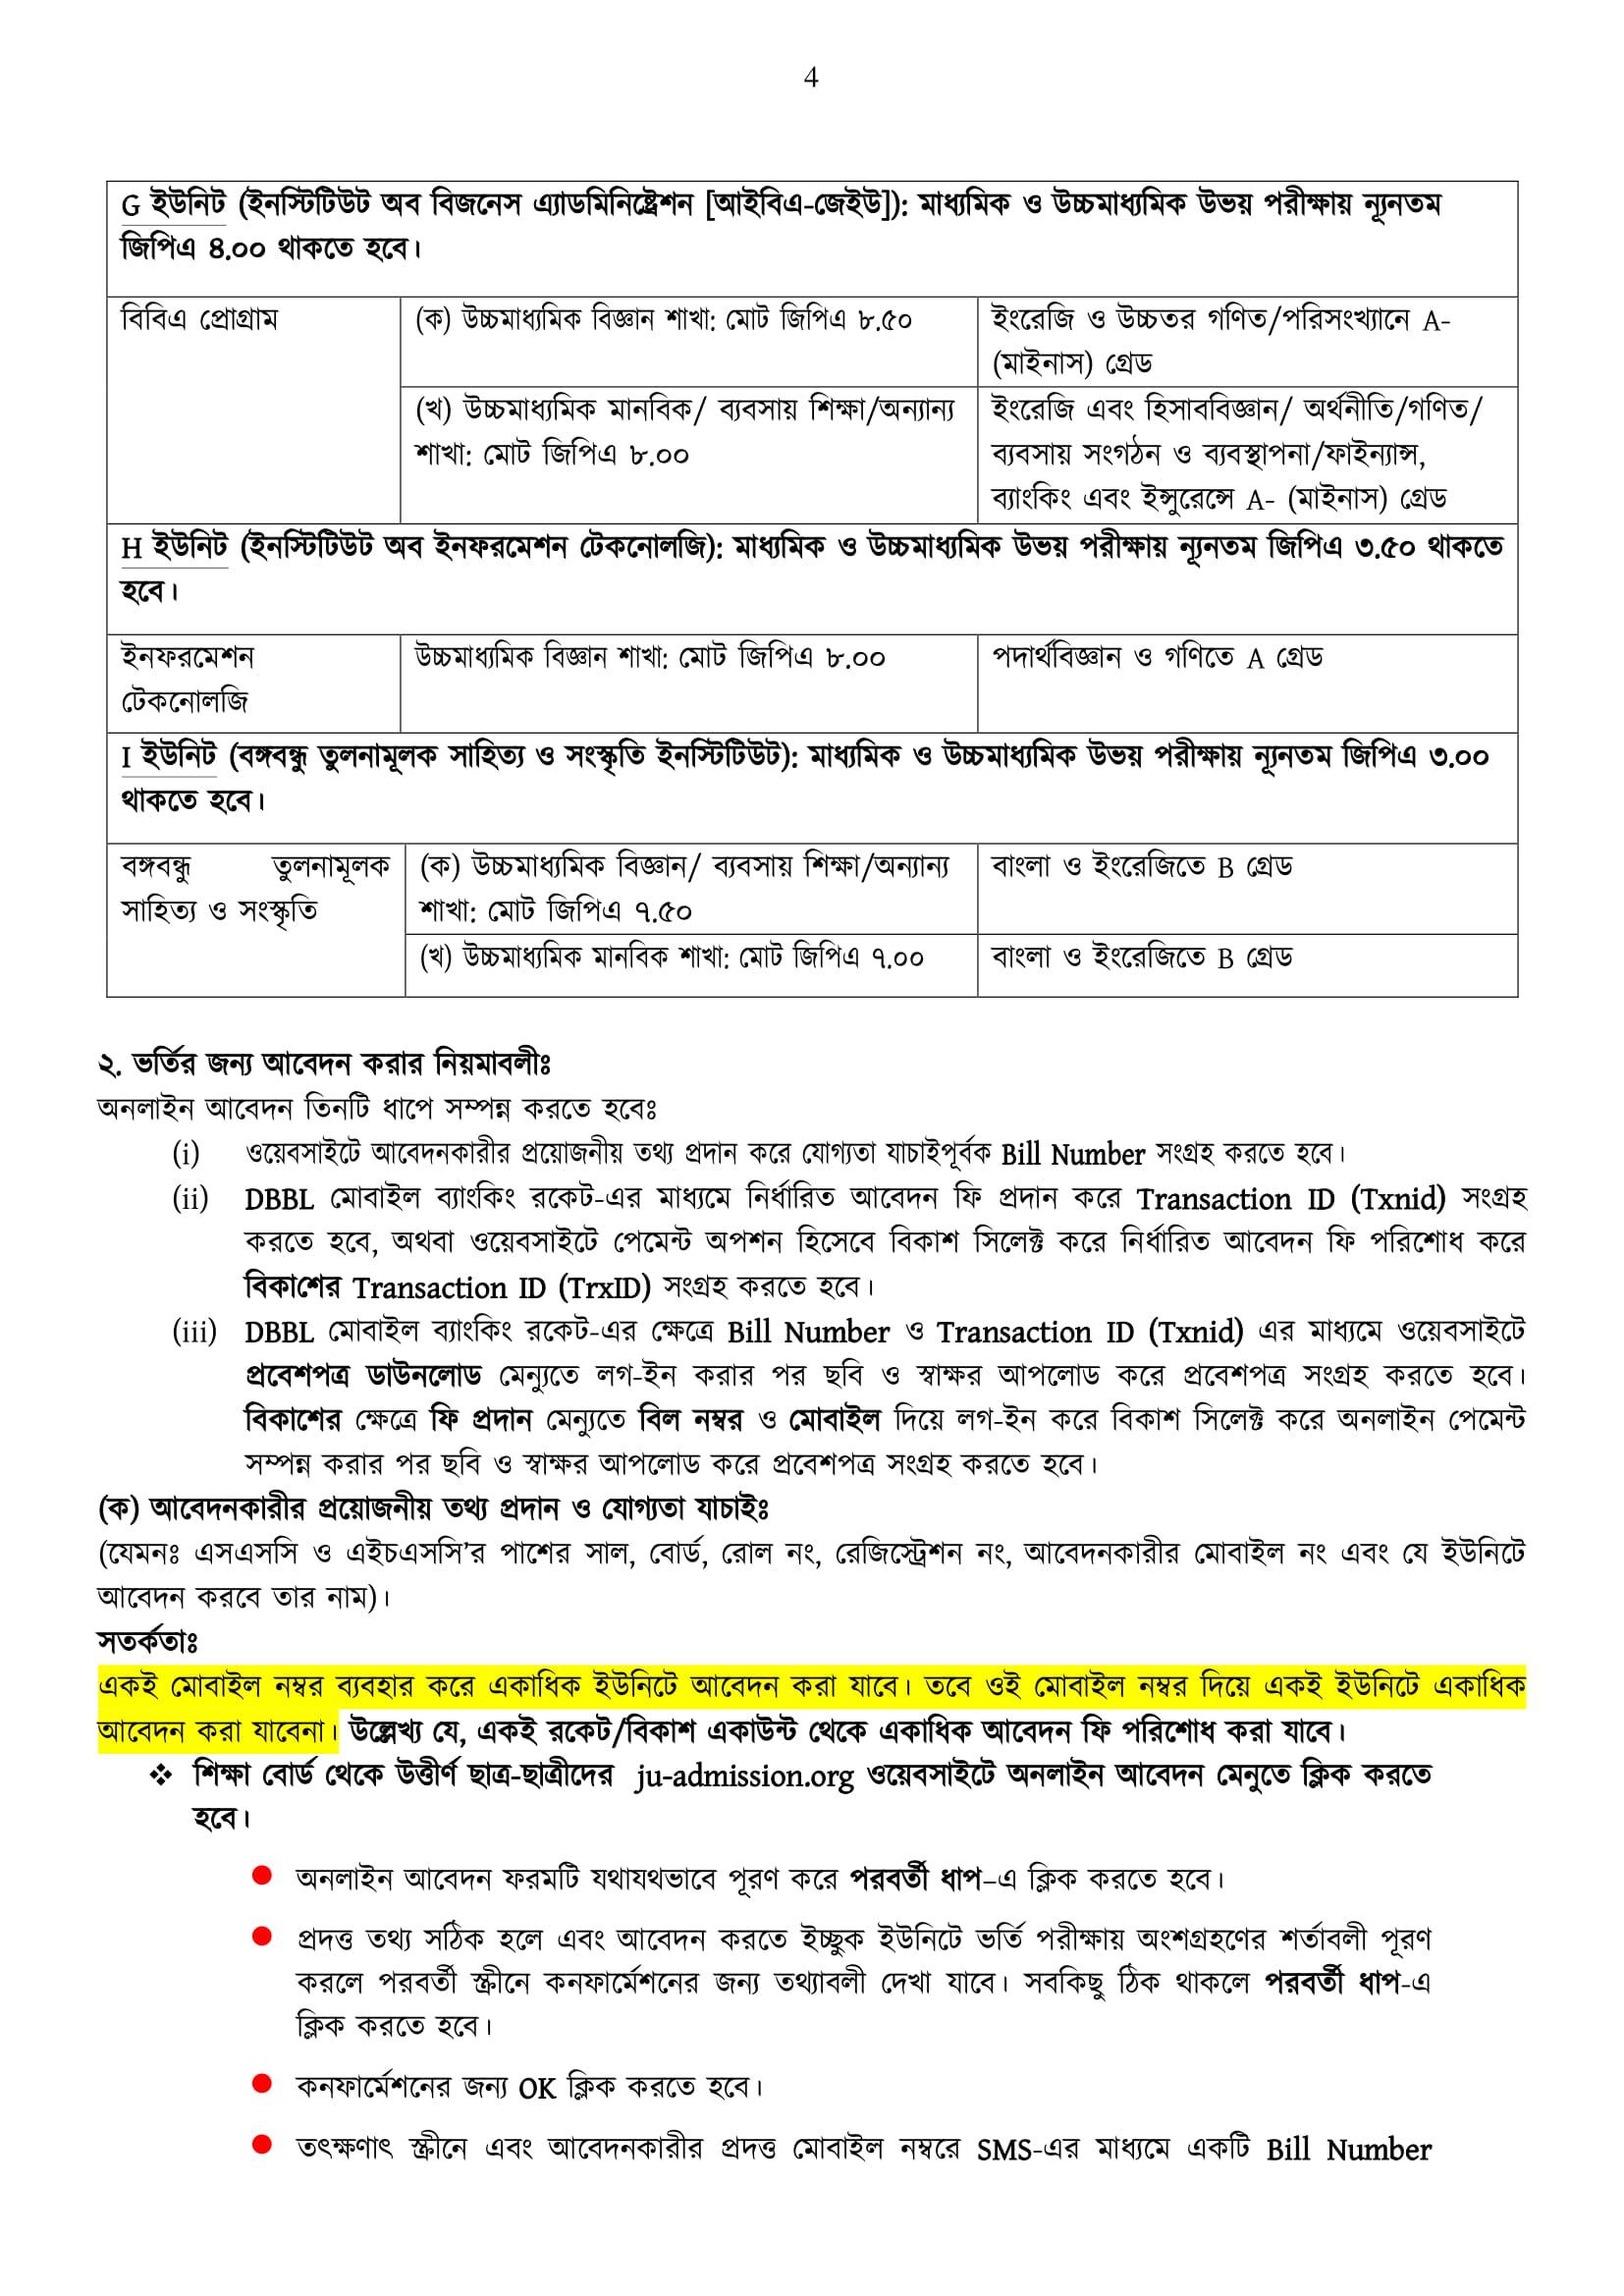 Jahangirnagar University Admission Circular 2020-21 4